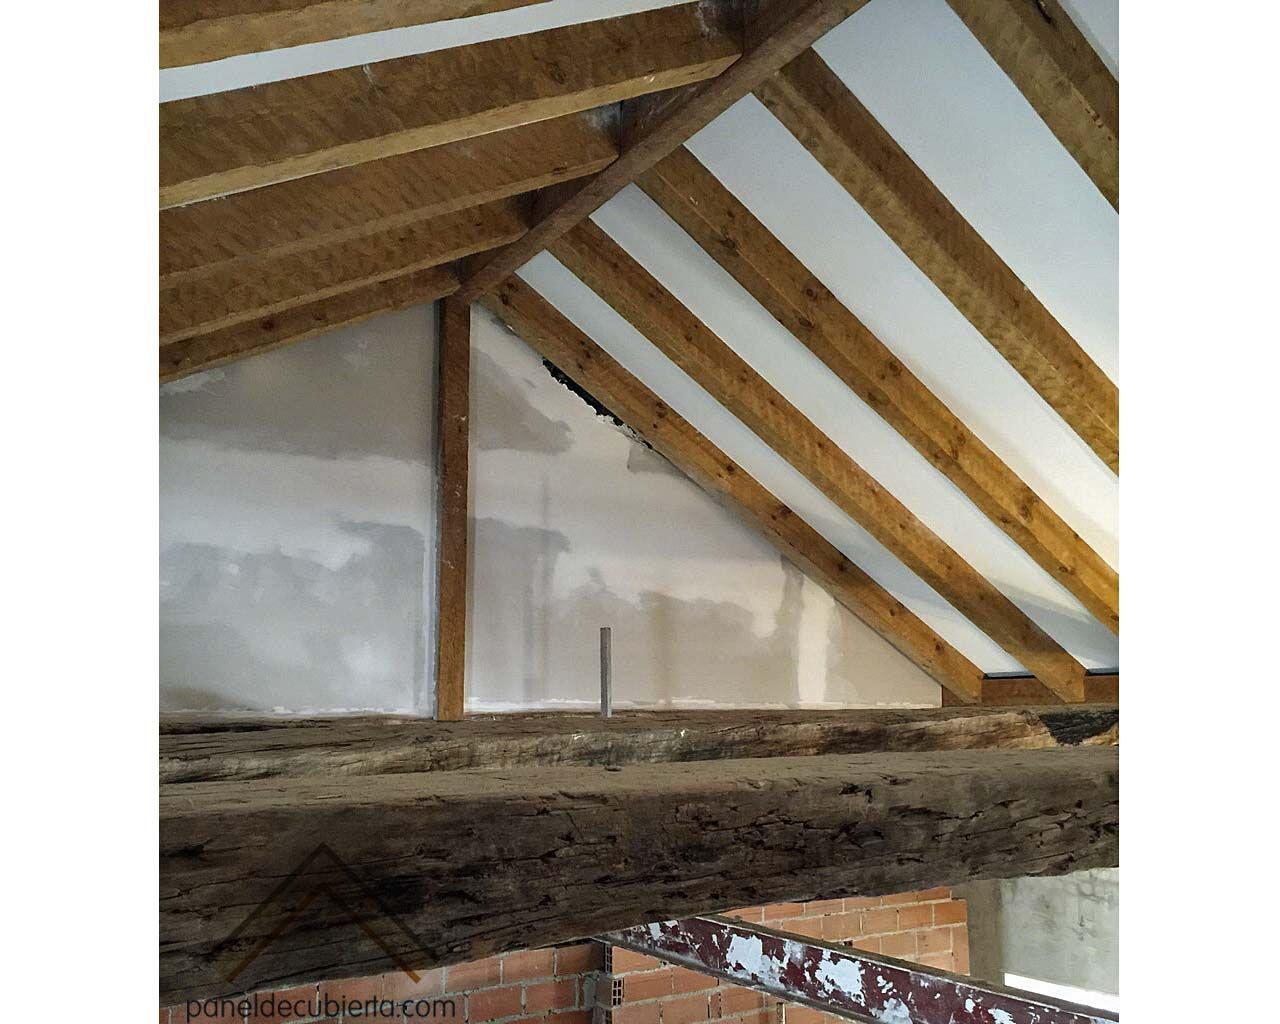 Colocaci n de panel de madera con n cleo aislante sobre for Aislante para tejados